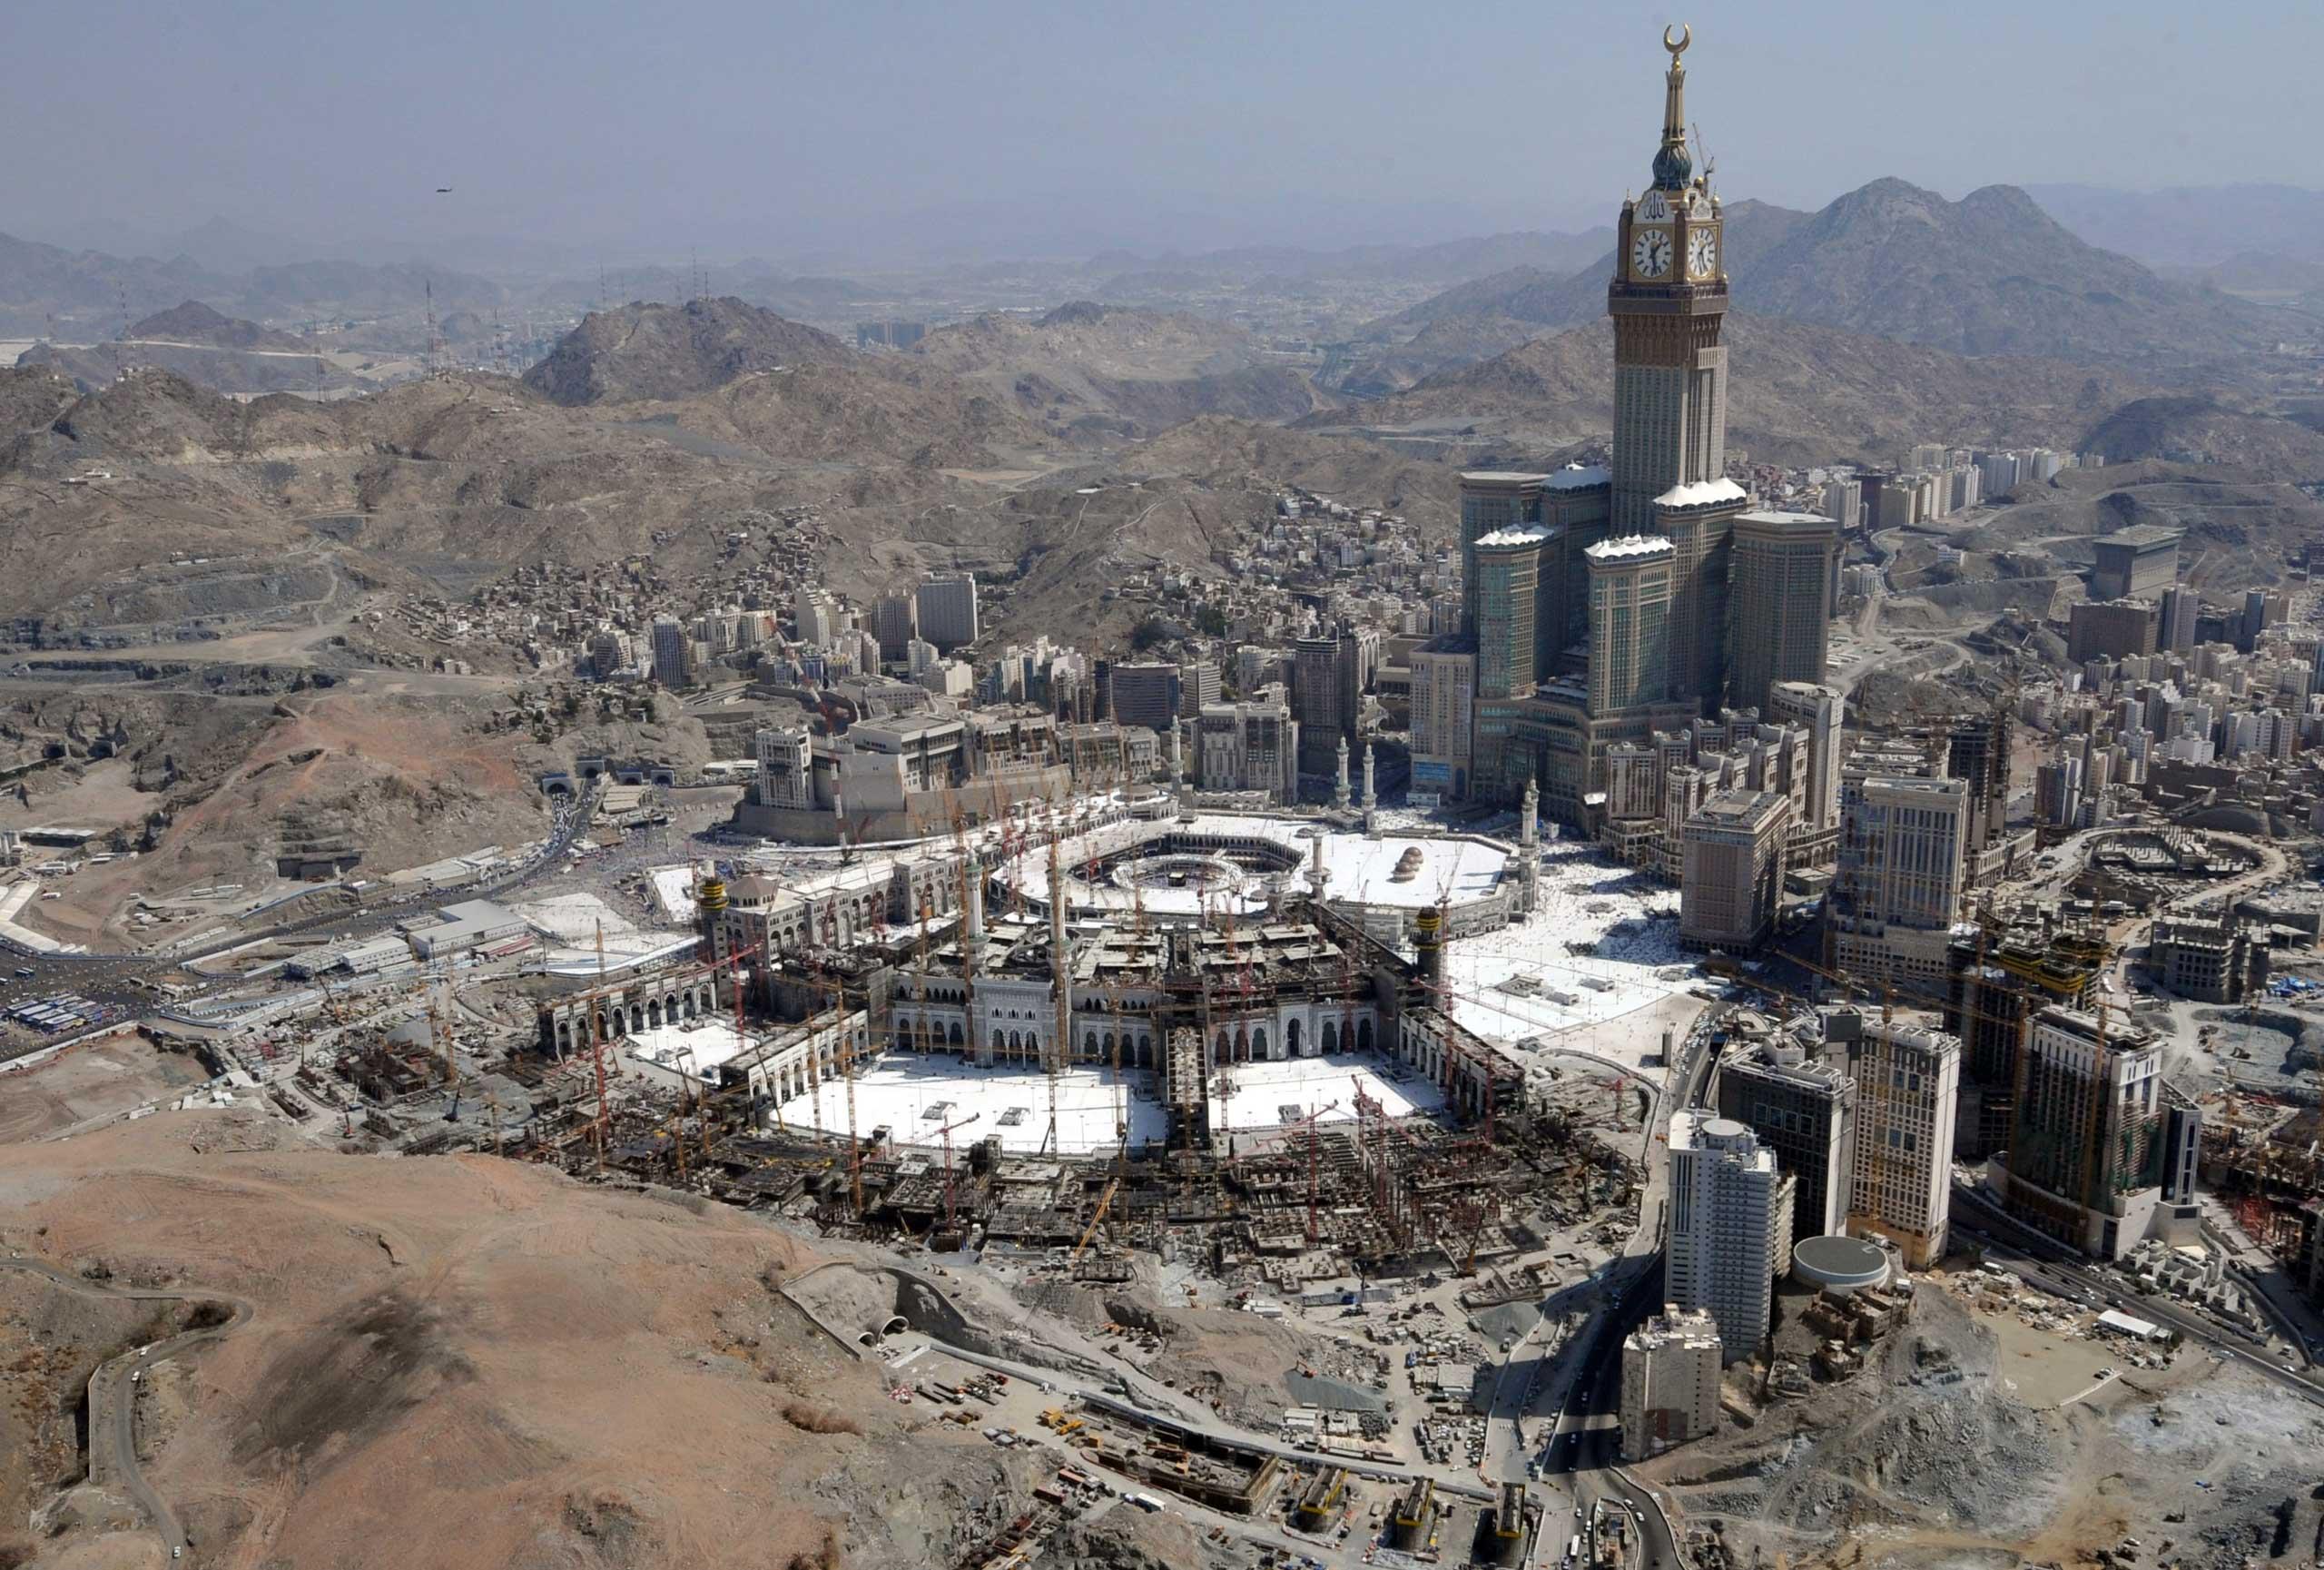 Saudi Arabia Bulldozes Over Its Heritage Time